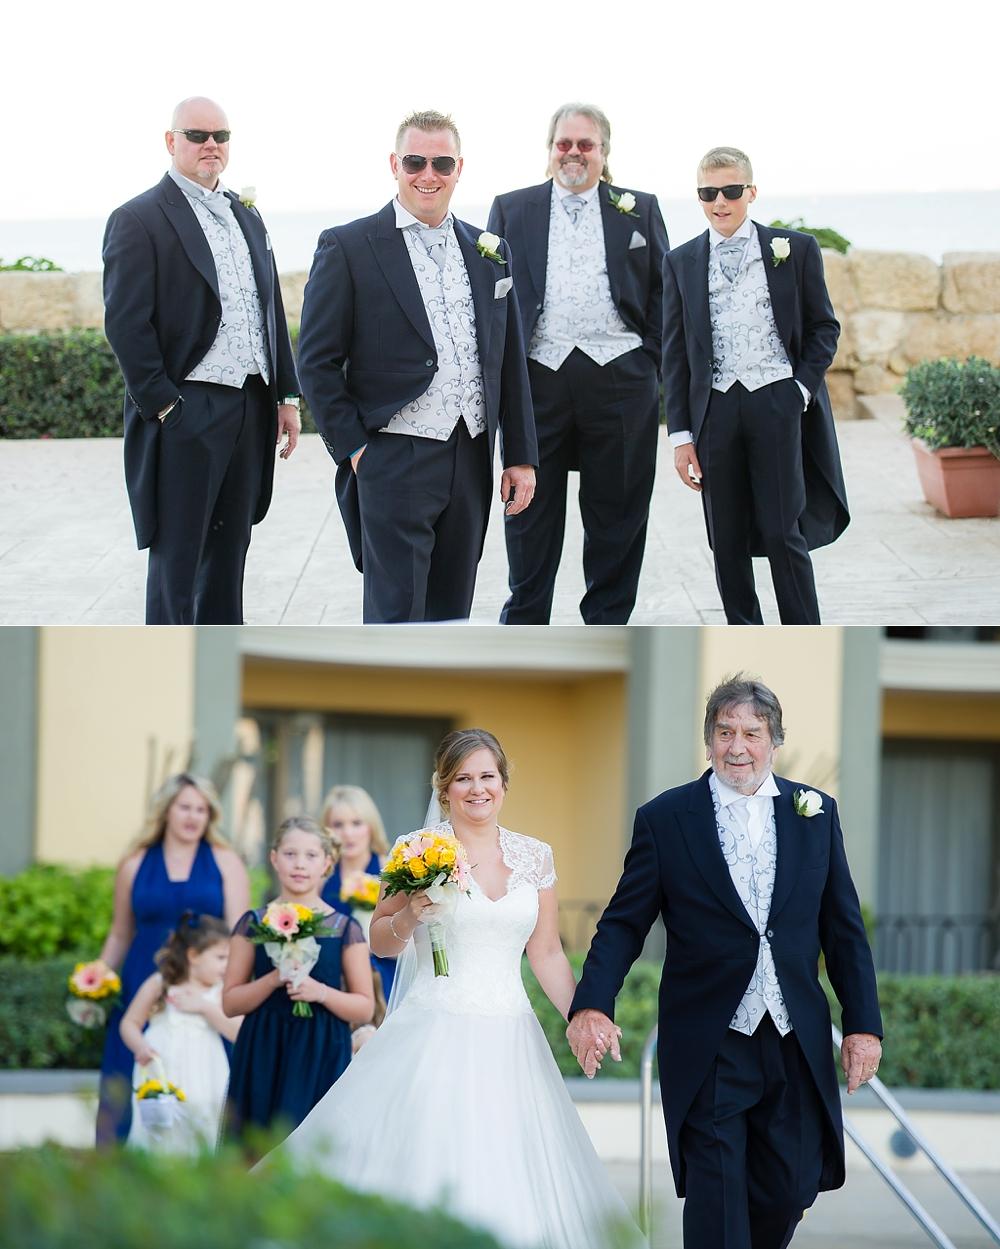 Wedding Photography - Hilton Portomaso - Shane P. Watts Photography